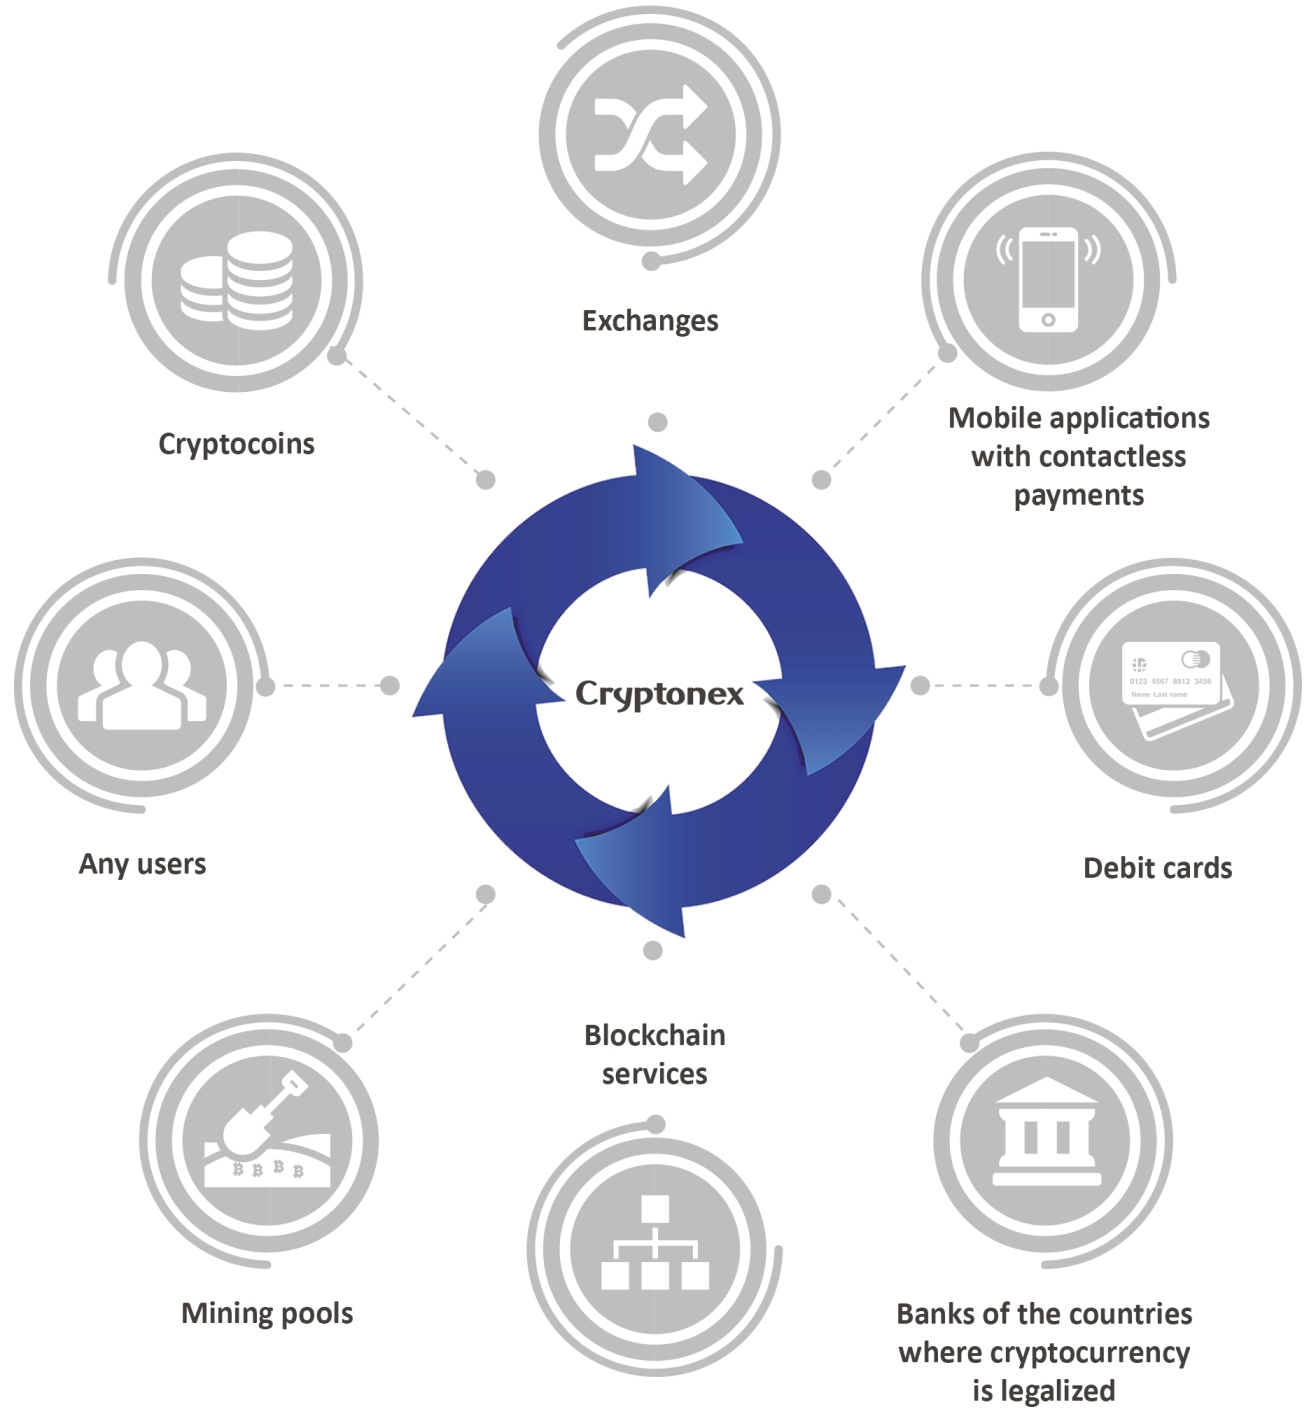 https://cryptonex.org/images/1000x400x1.jpg